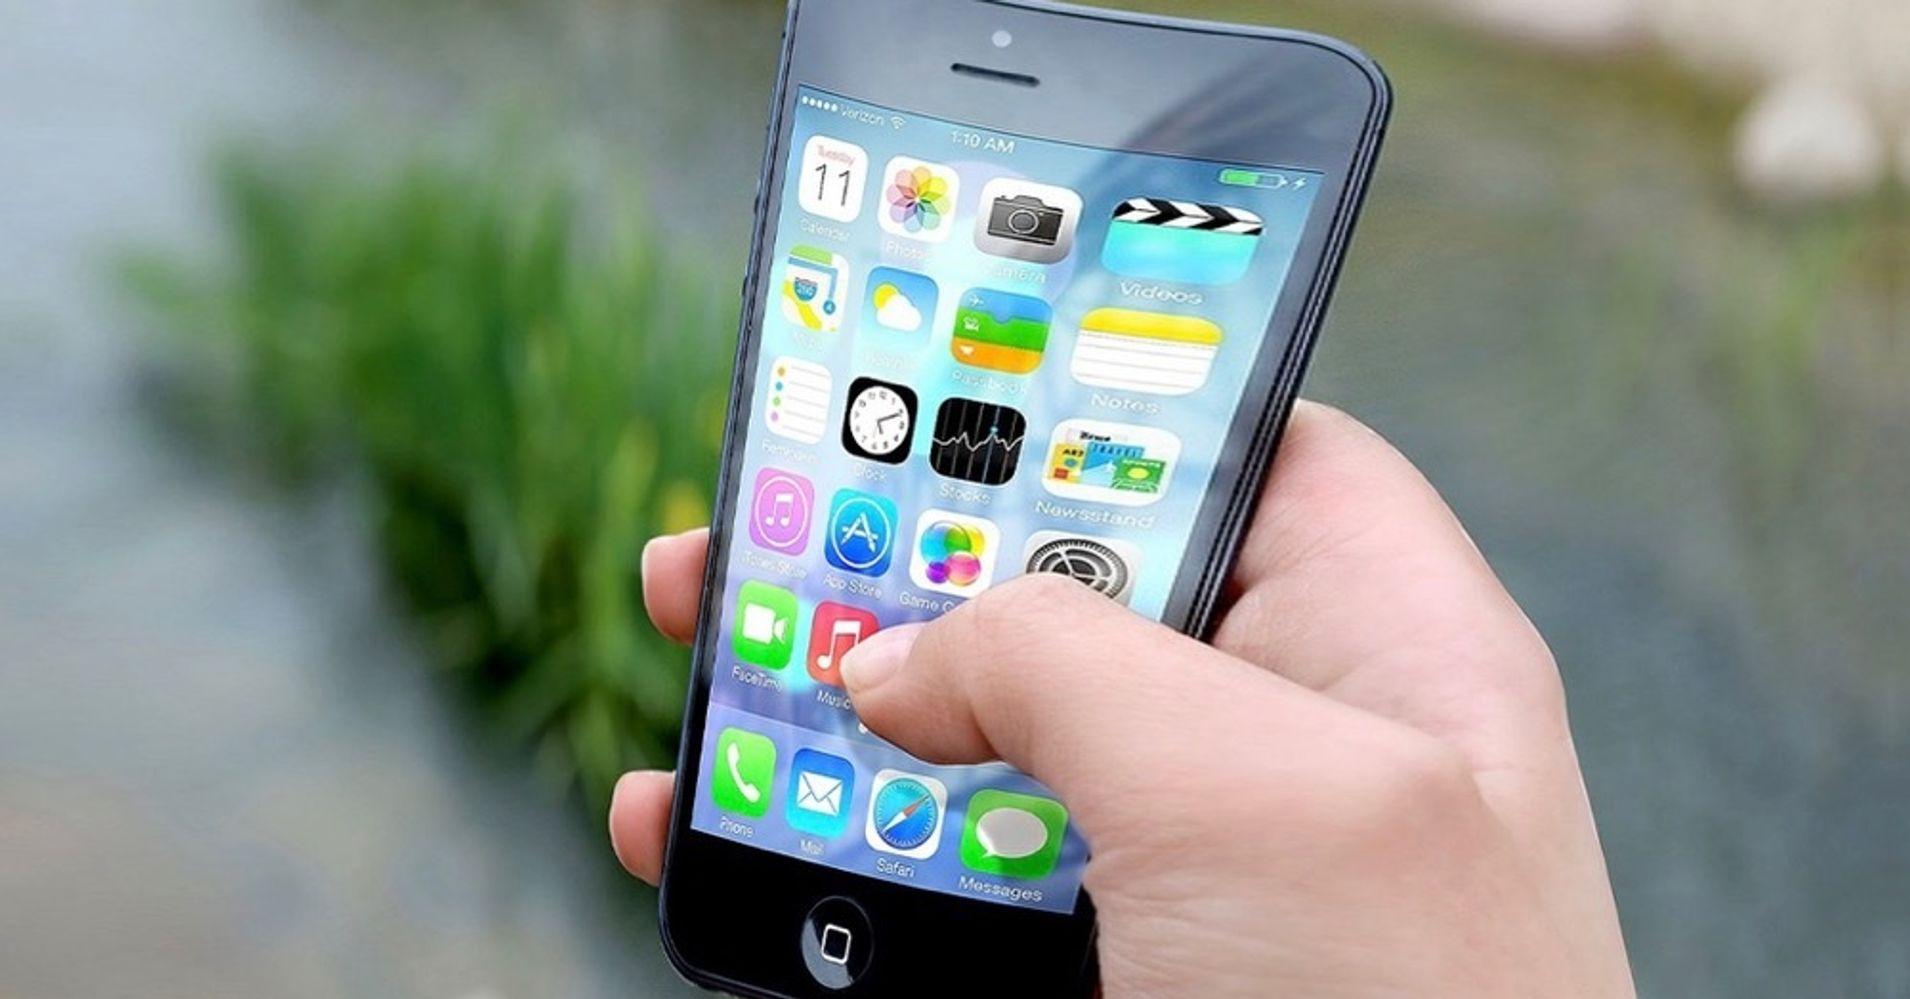 CamScanner Phone PDF Creator v59120190126 UNLOCKED APK